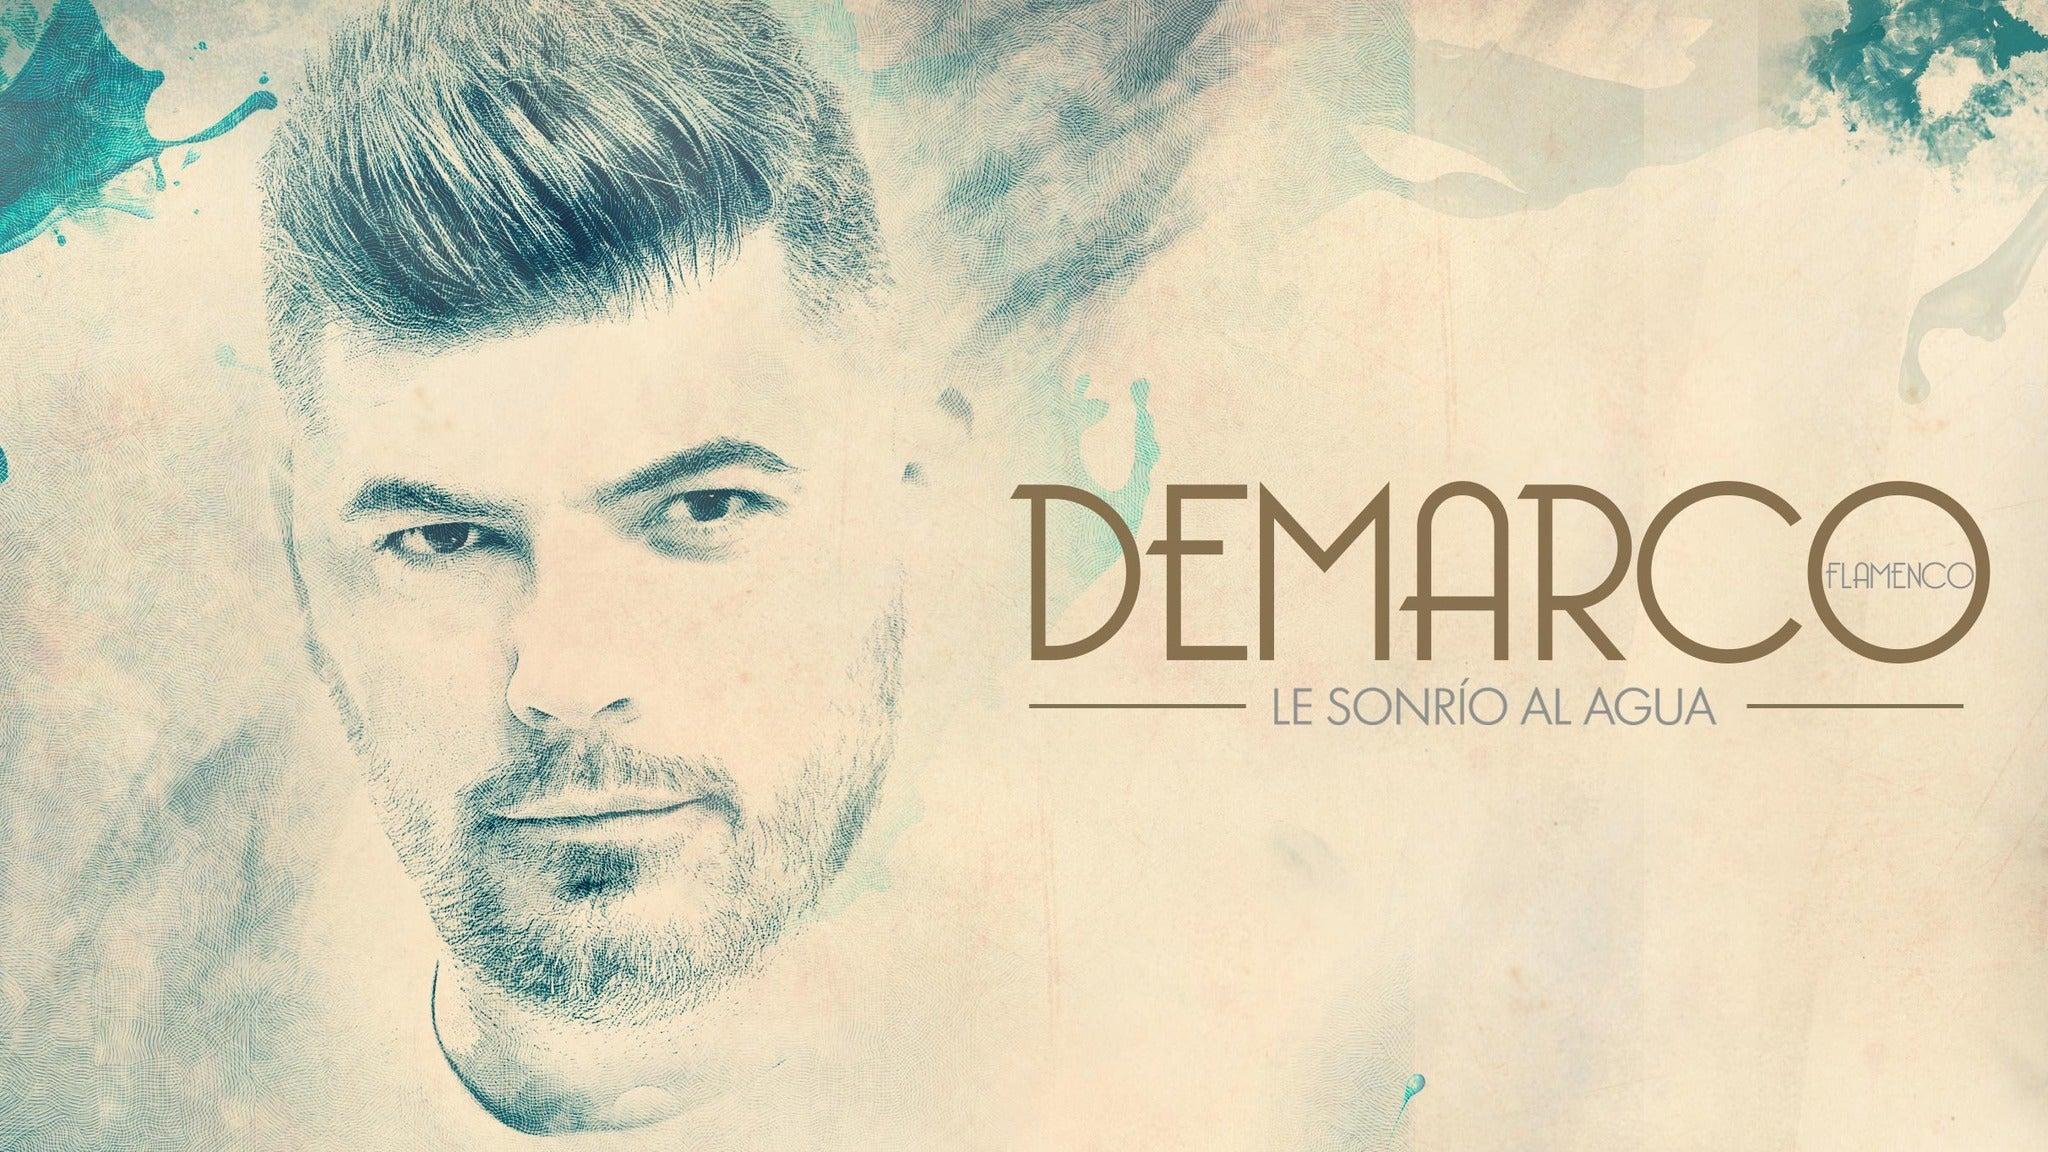 Demarco Flamenco - Le sonrío al agua